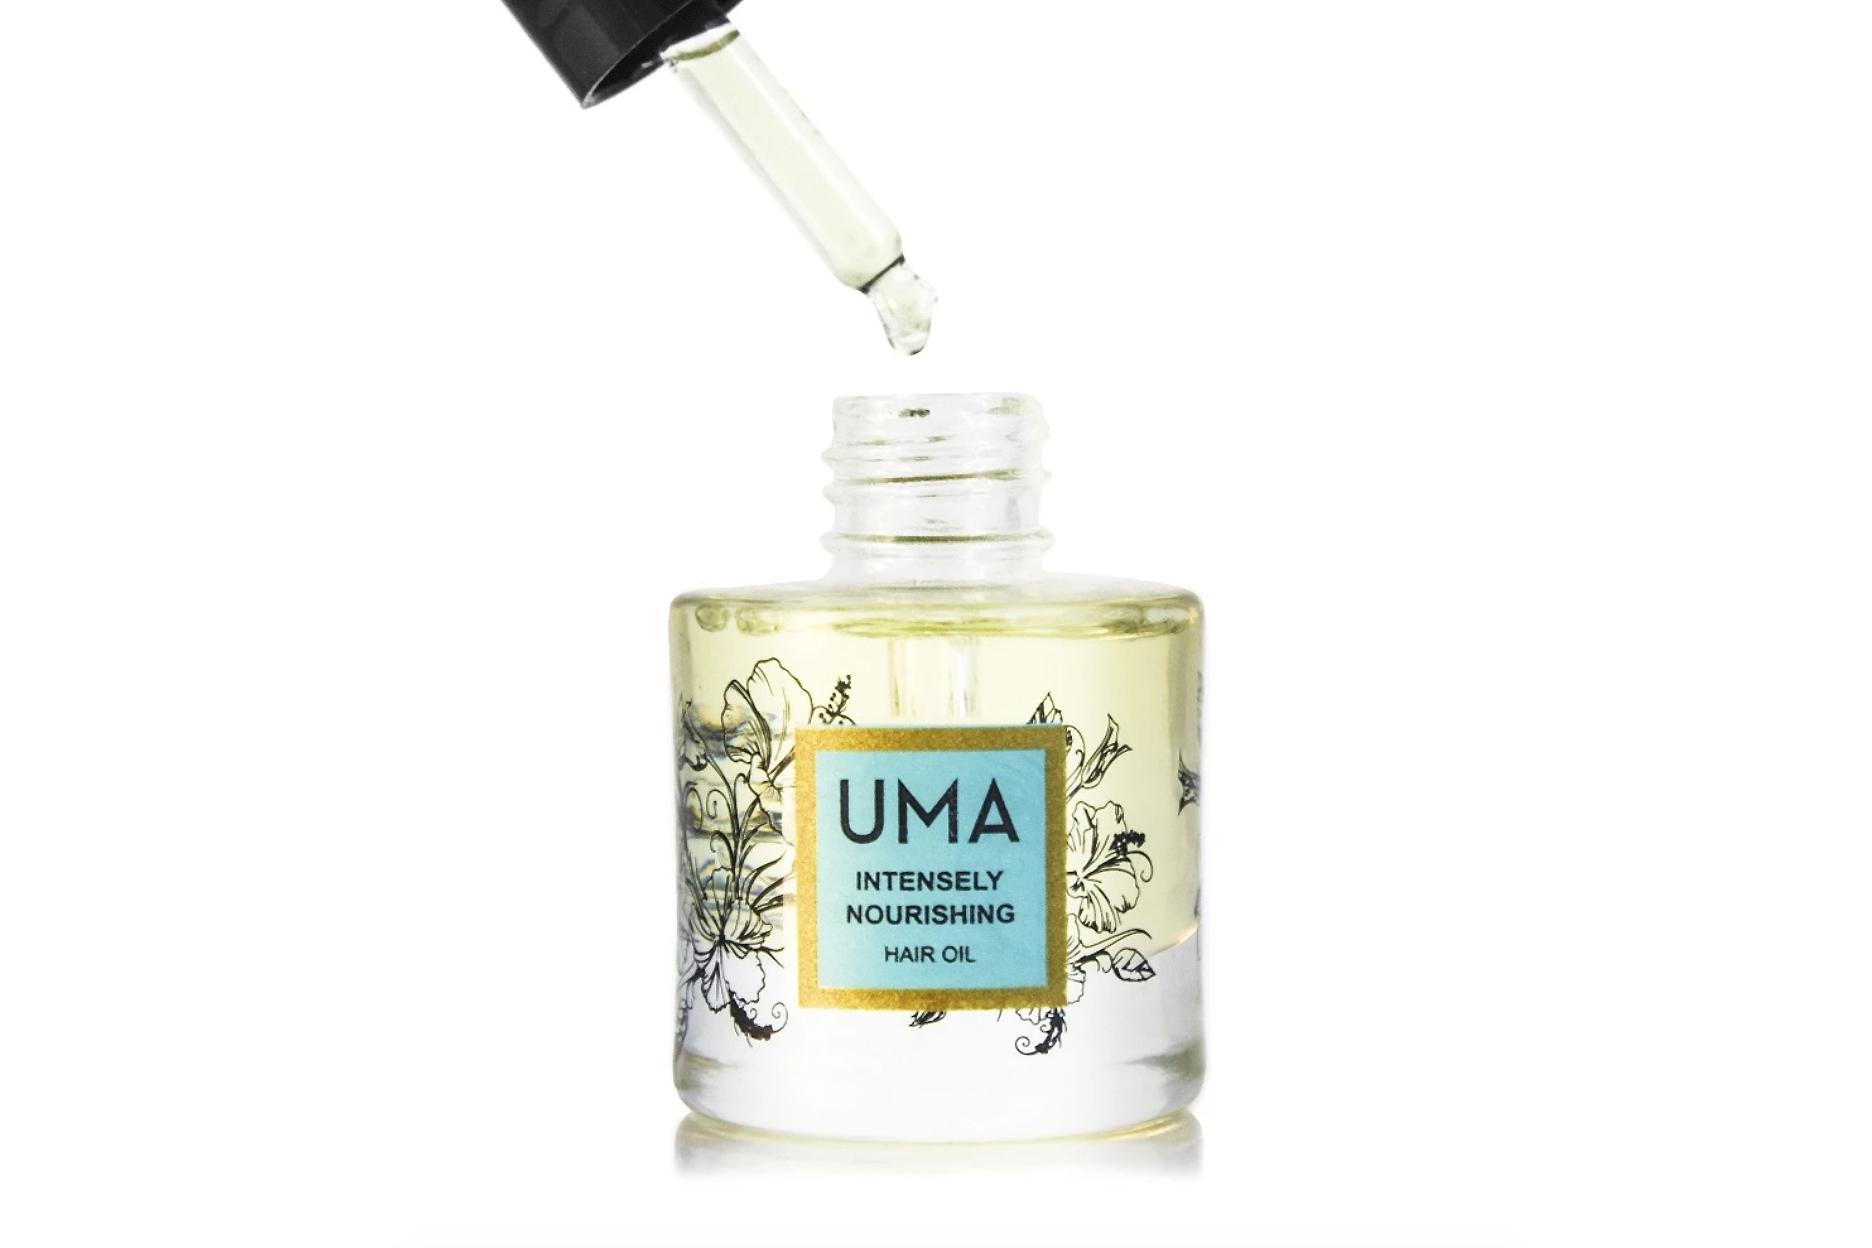 ayurveda ayurvedic beauty UMA oils